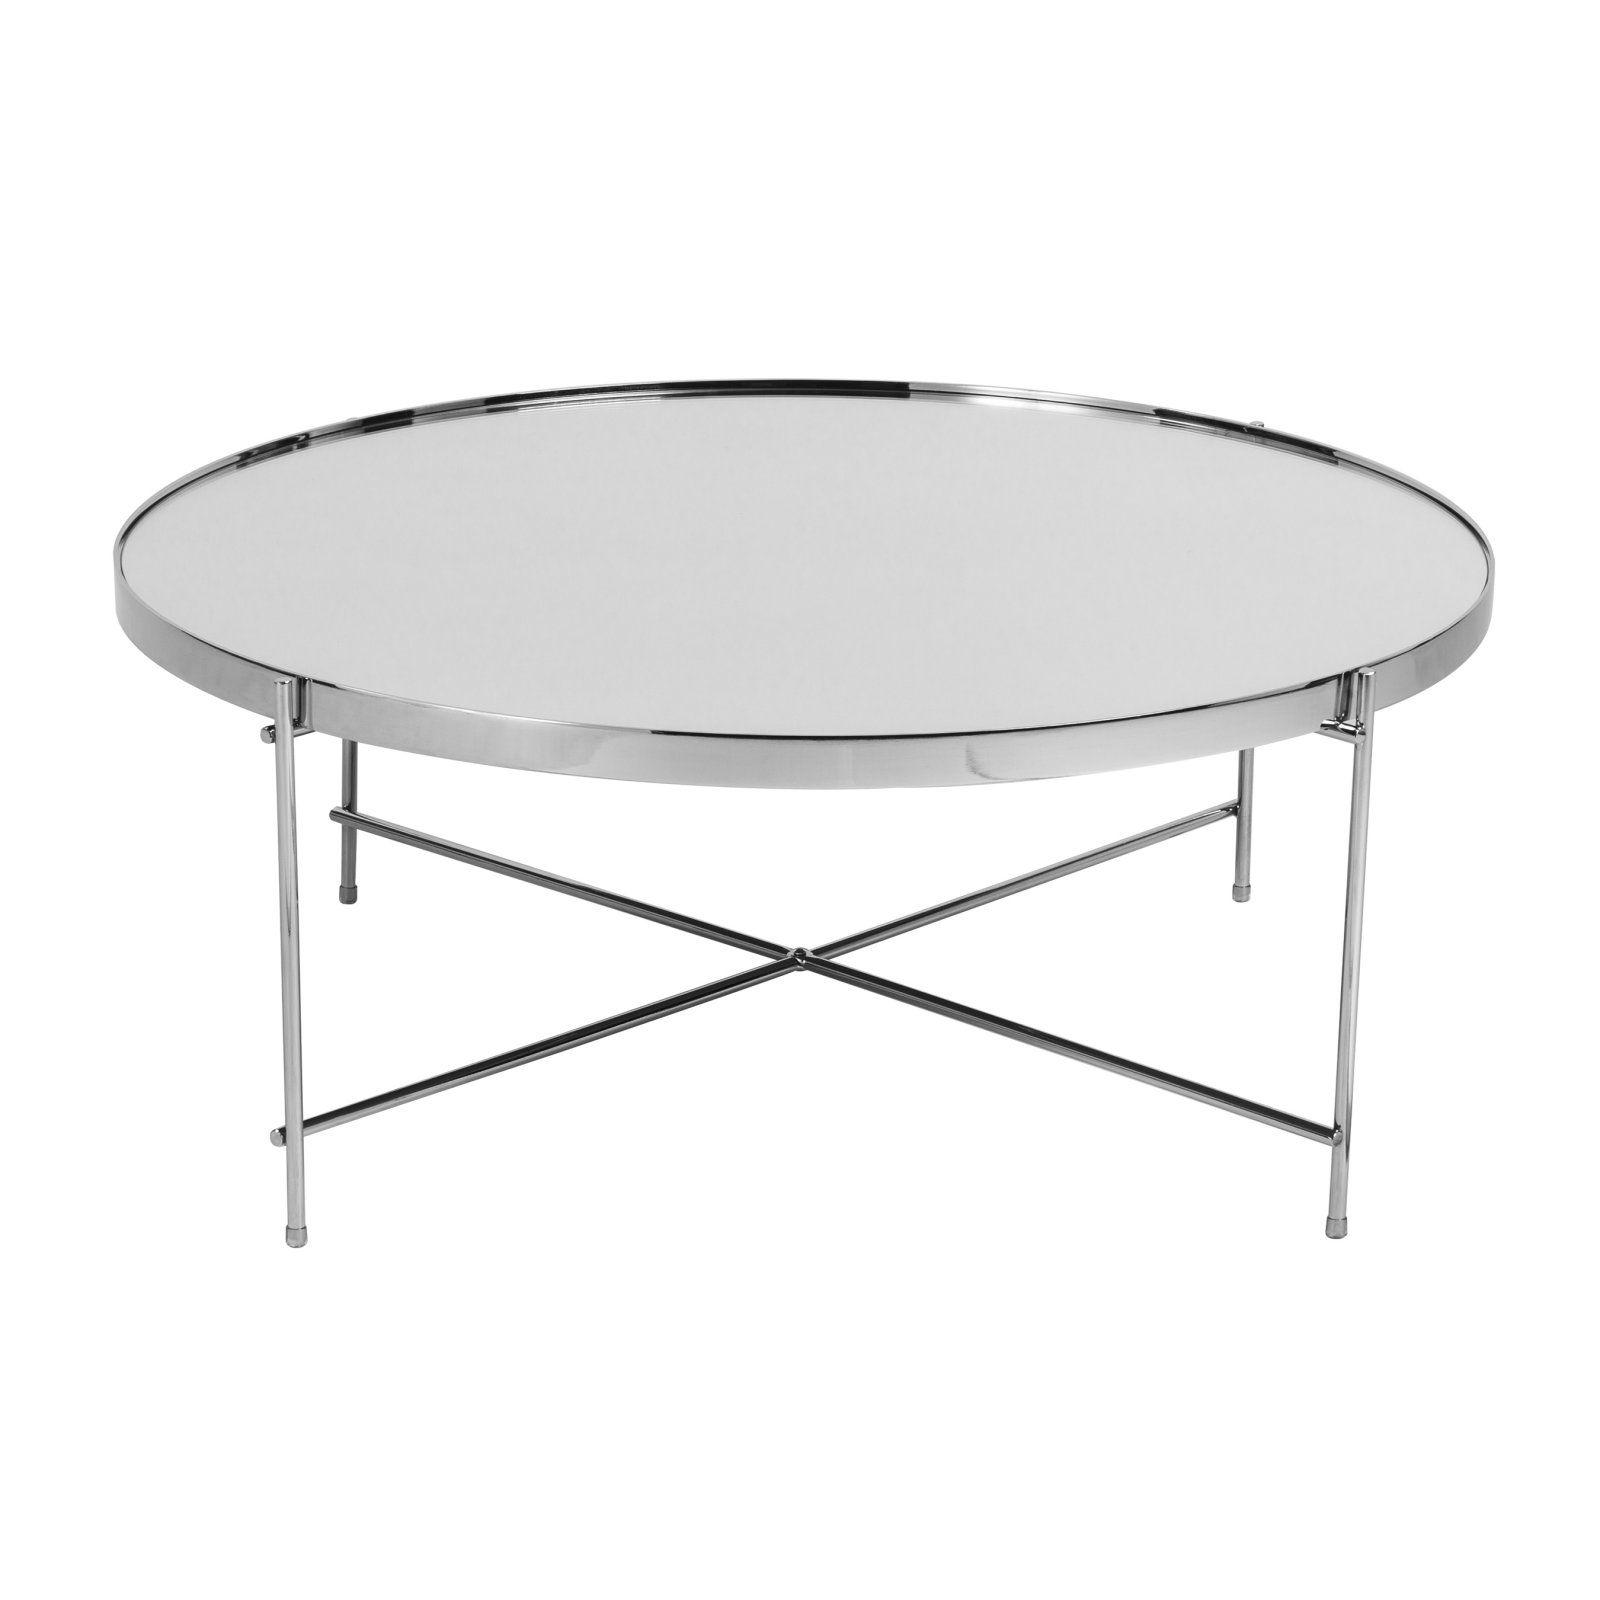 Euro Style Juno Coffee Table Cheap Coffee Table Round Wood Coffee Table Coffee Table [ 1600 x 1600 Pixel ]